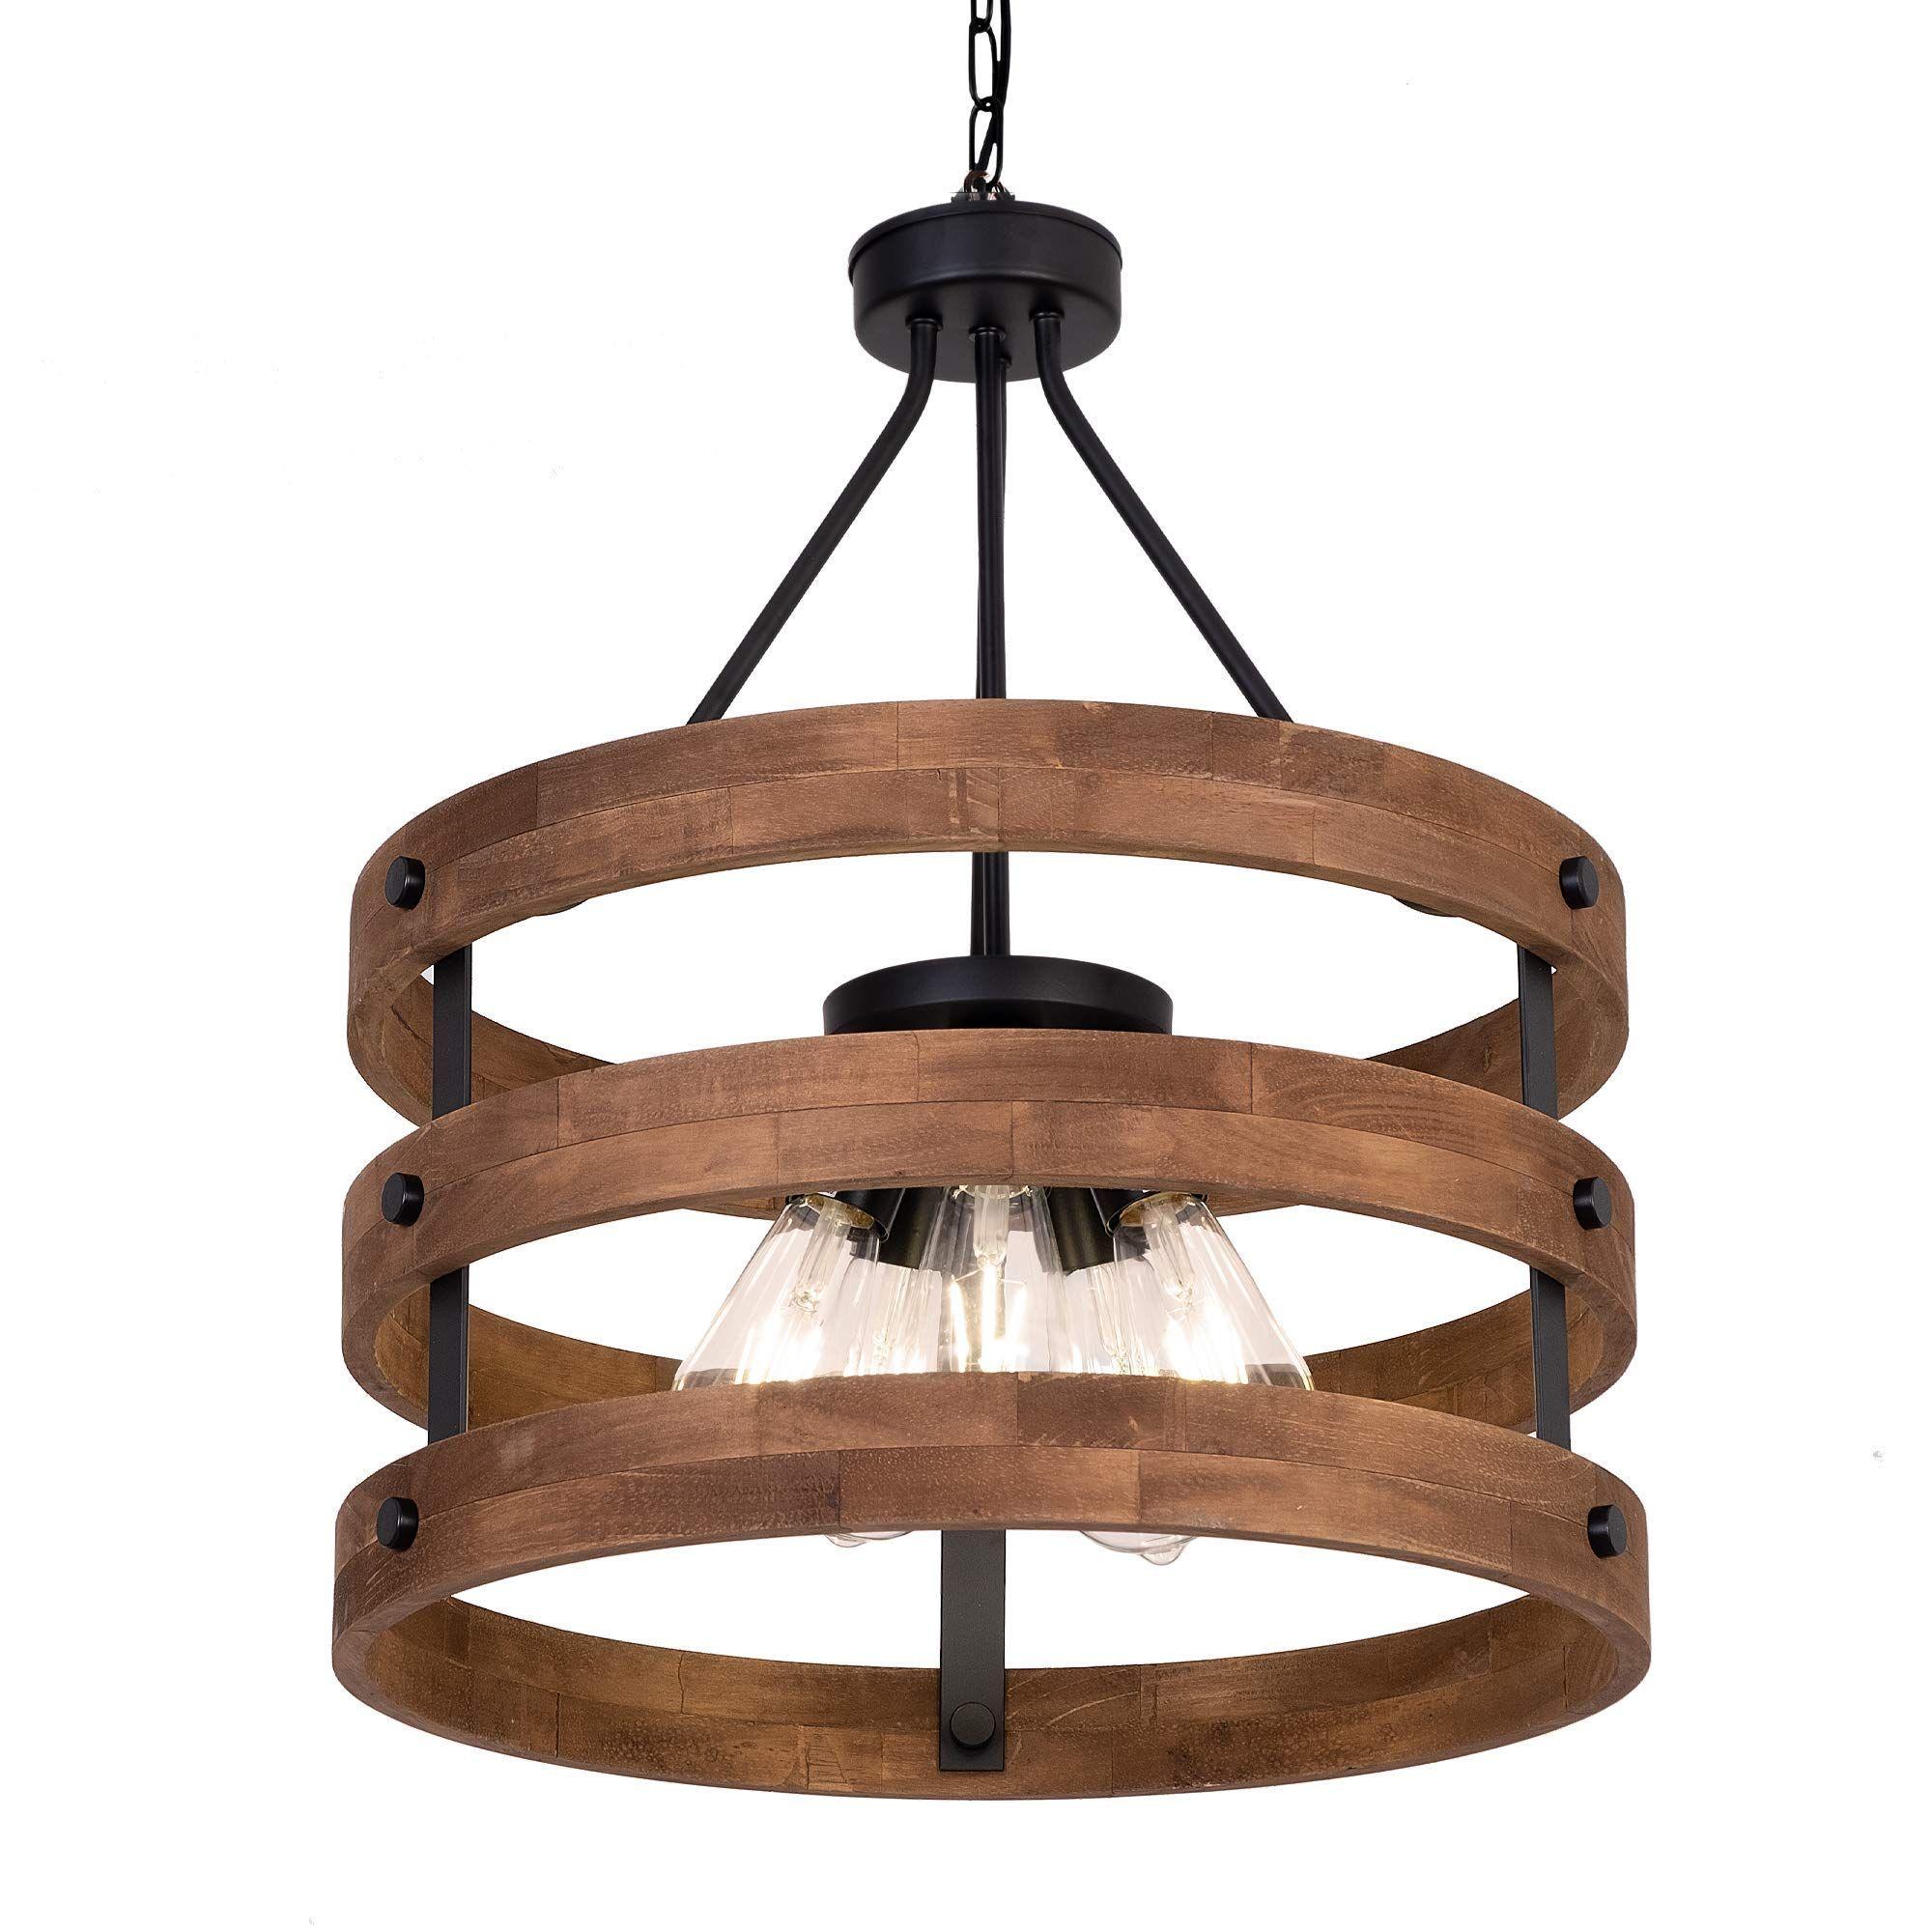 Industrial Chandelier Wood In 2020 Modern Rustic Chandelier Rustic Chandelier Vintage Ceiling Light Fixtures